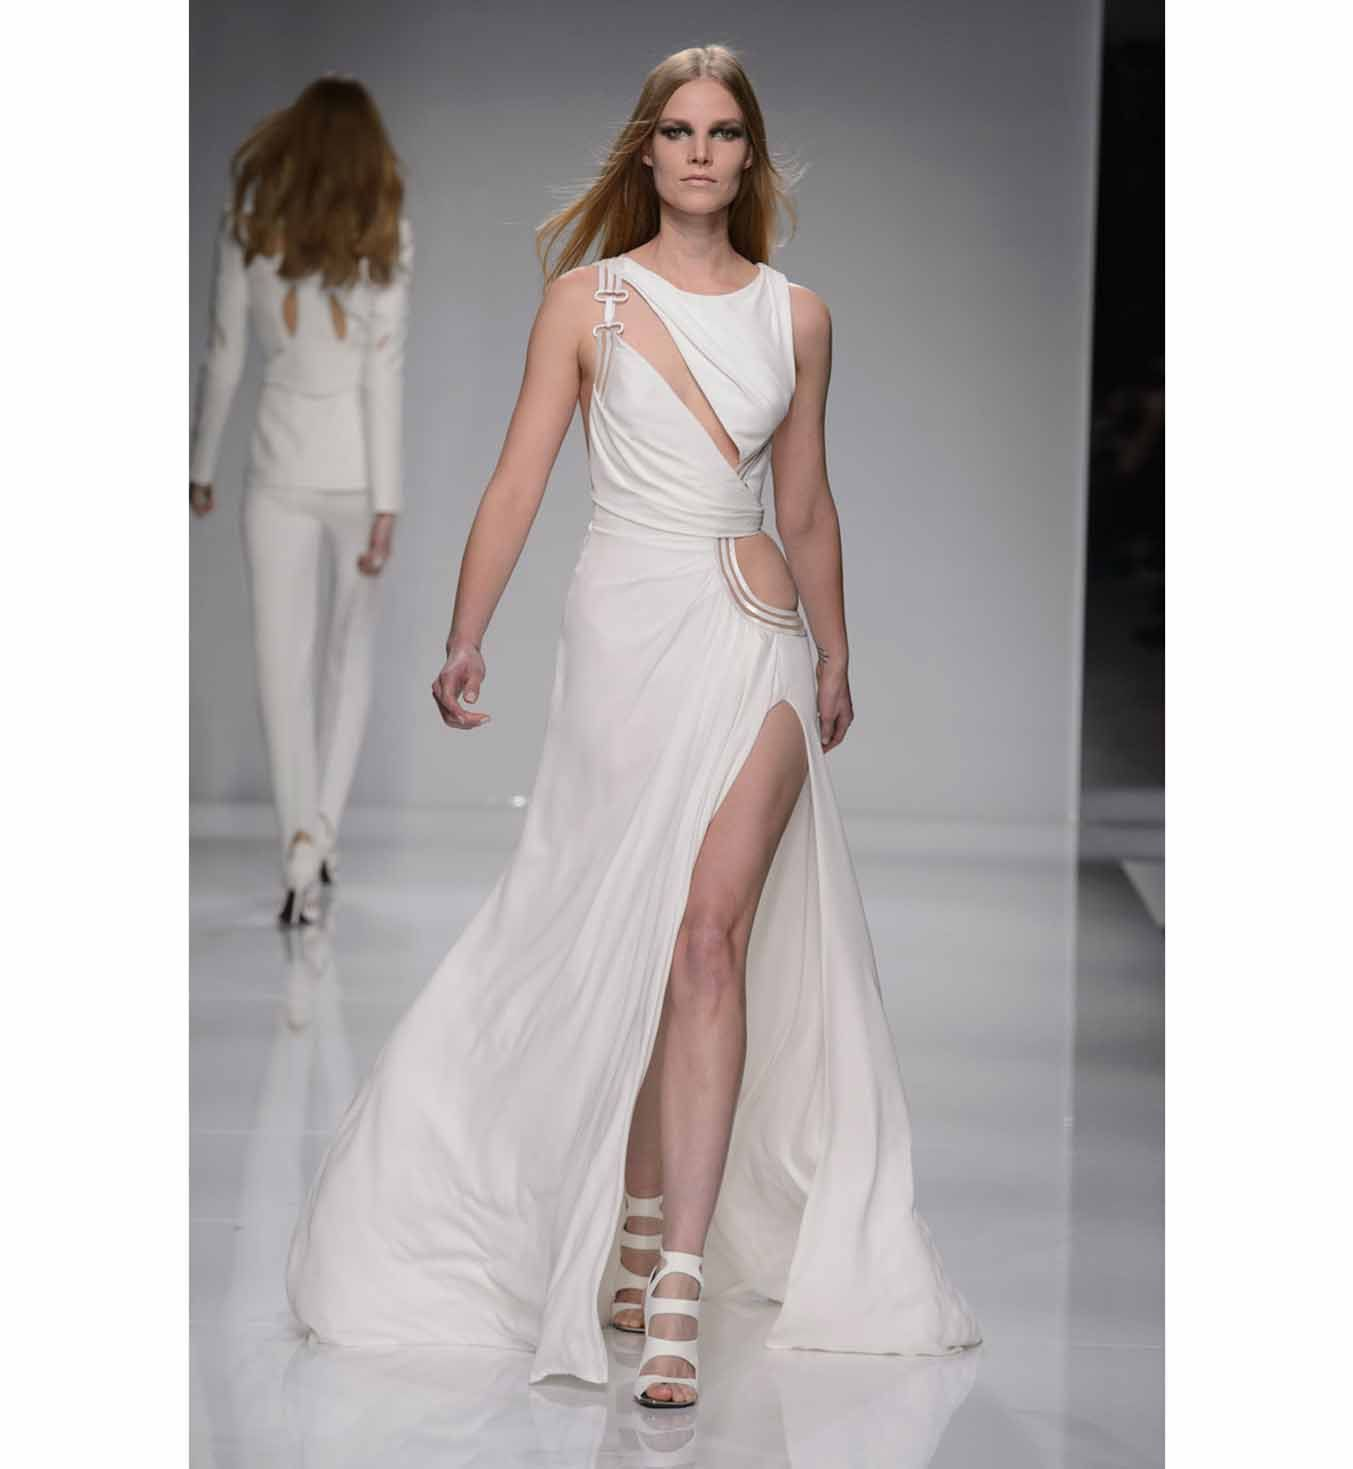 Versace wedding dress  robemarieeversace  HAUTE COUTURE  Pinterest  Versace and Robe